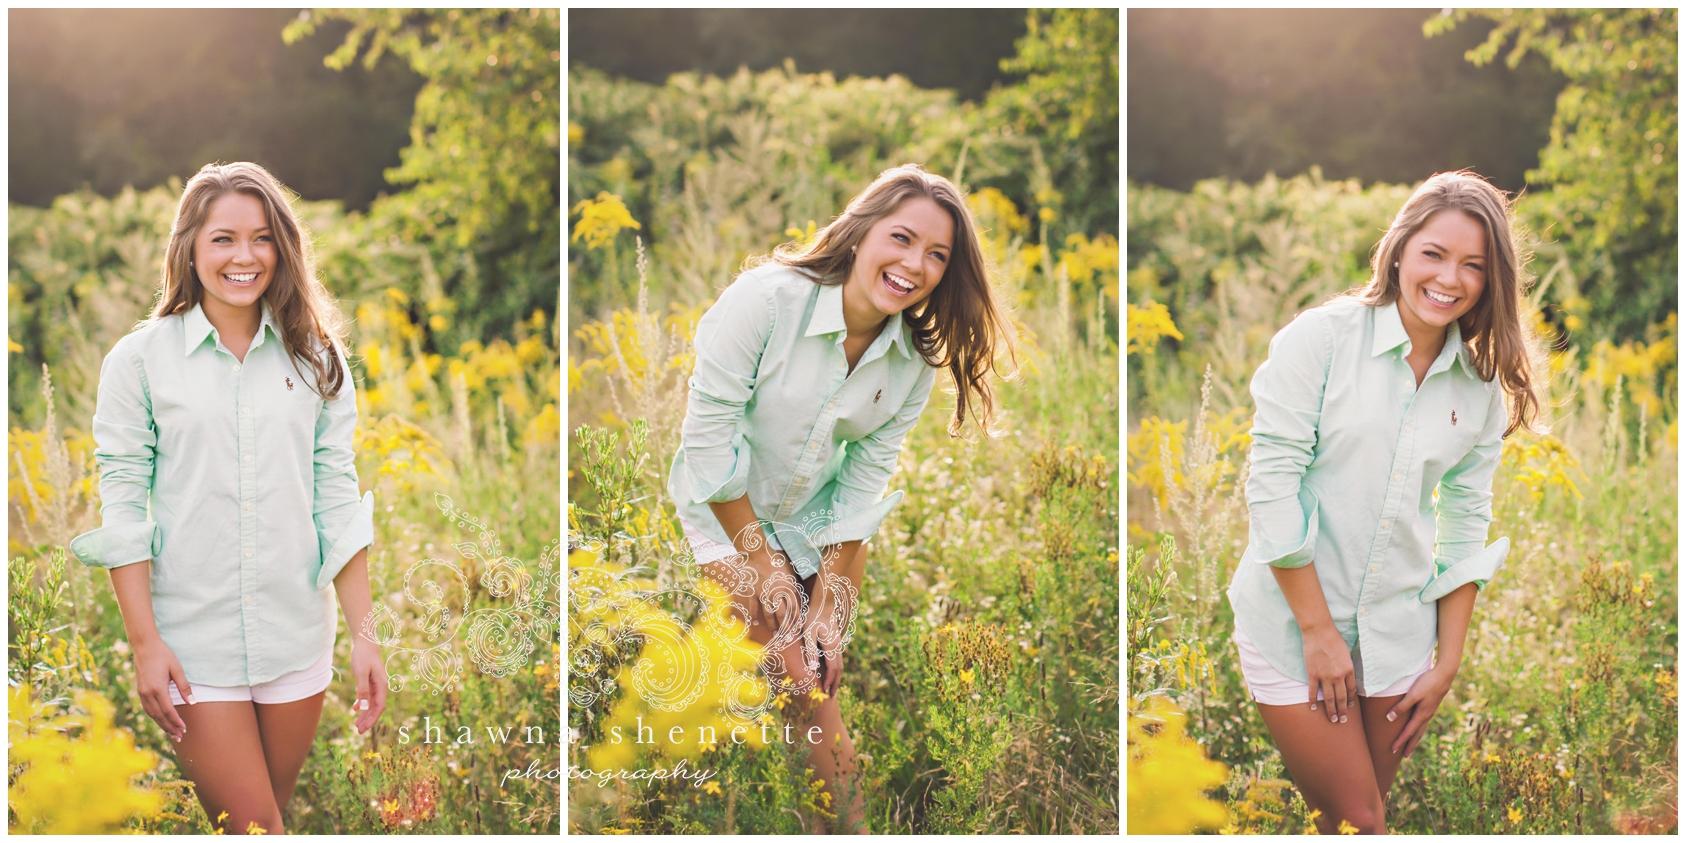 Massachusetts Senior Photographer Worcester Academy 2015 Senior Portraits Millbury MA Senior Photos